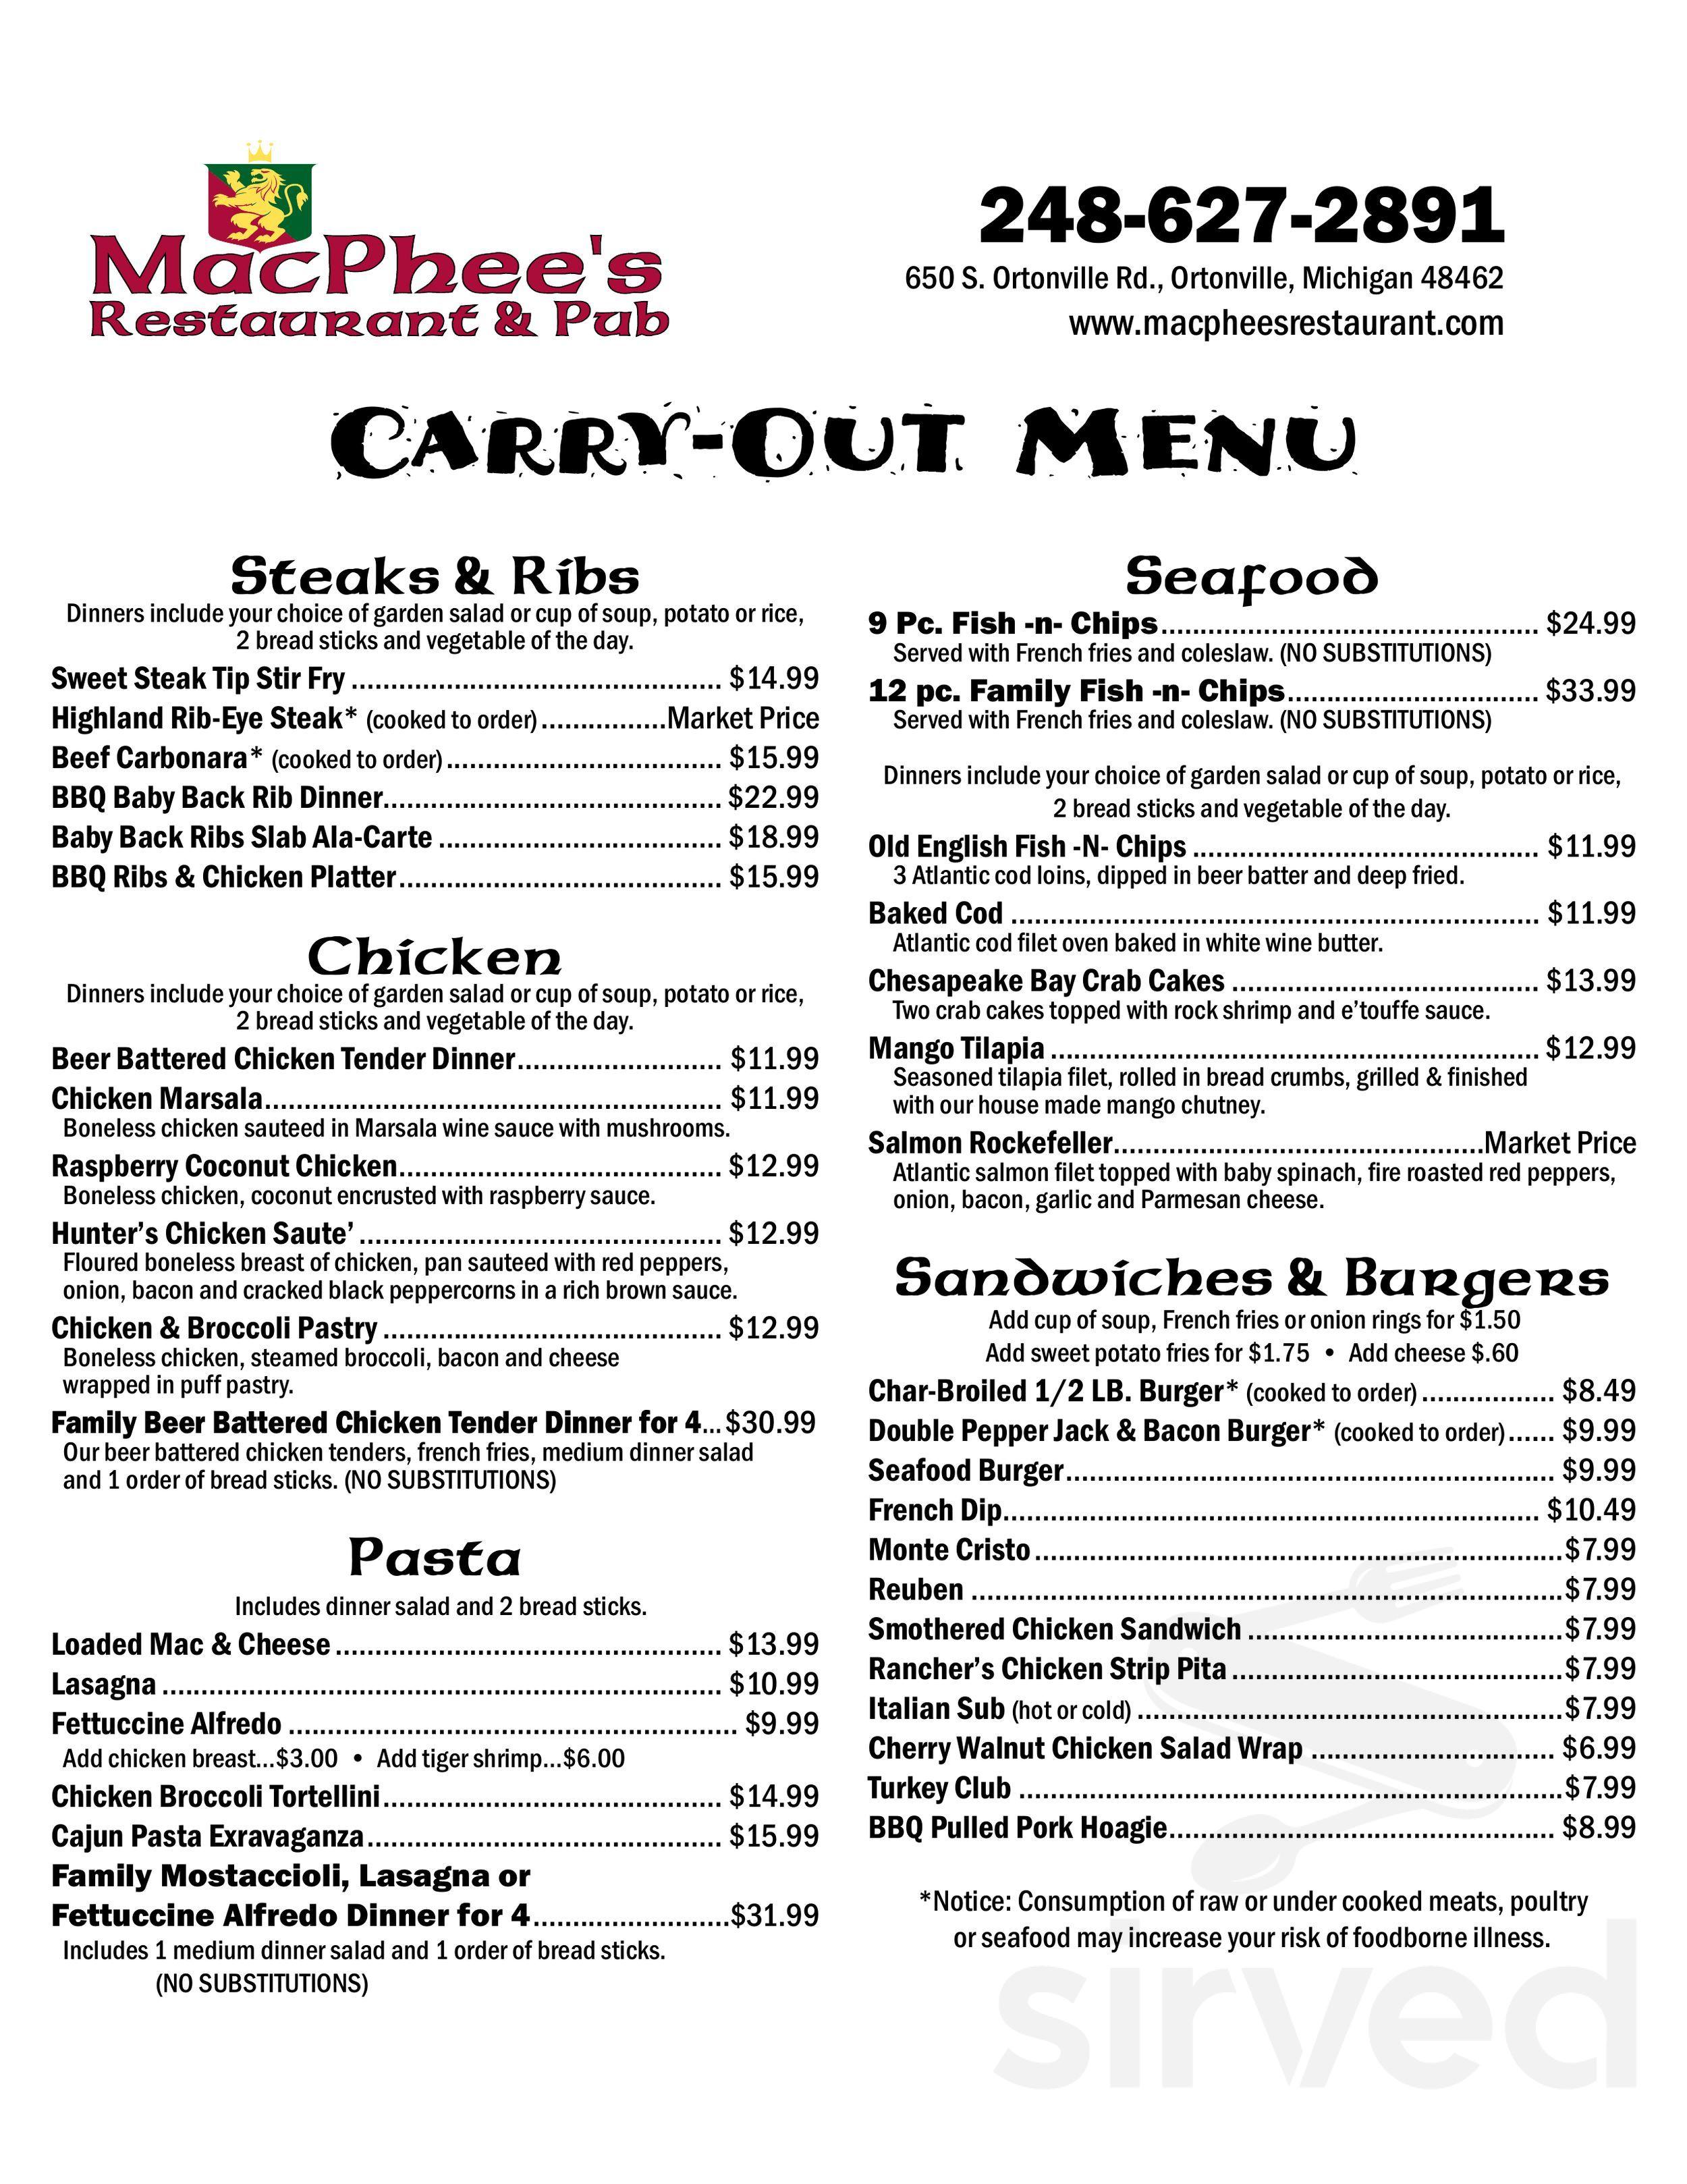 Menu for Macphee's Restaurant & Pub in Ortonville, Michigan